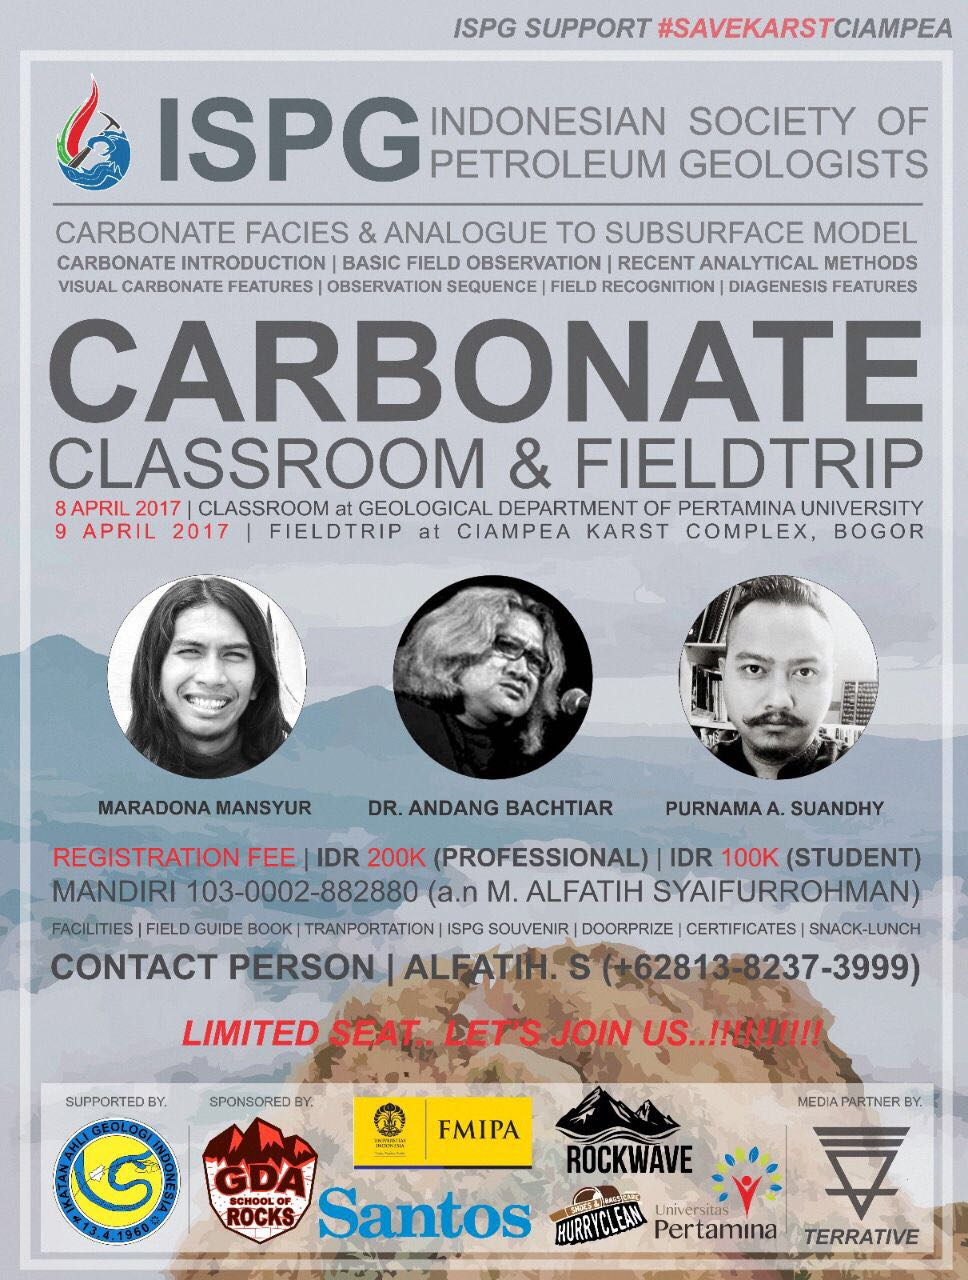 ISPG CARBONATE CLASSROOM & FIELDTRIP